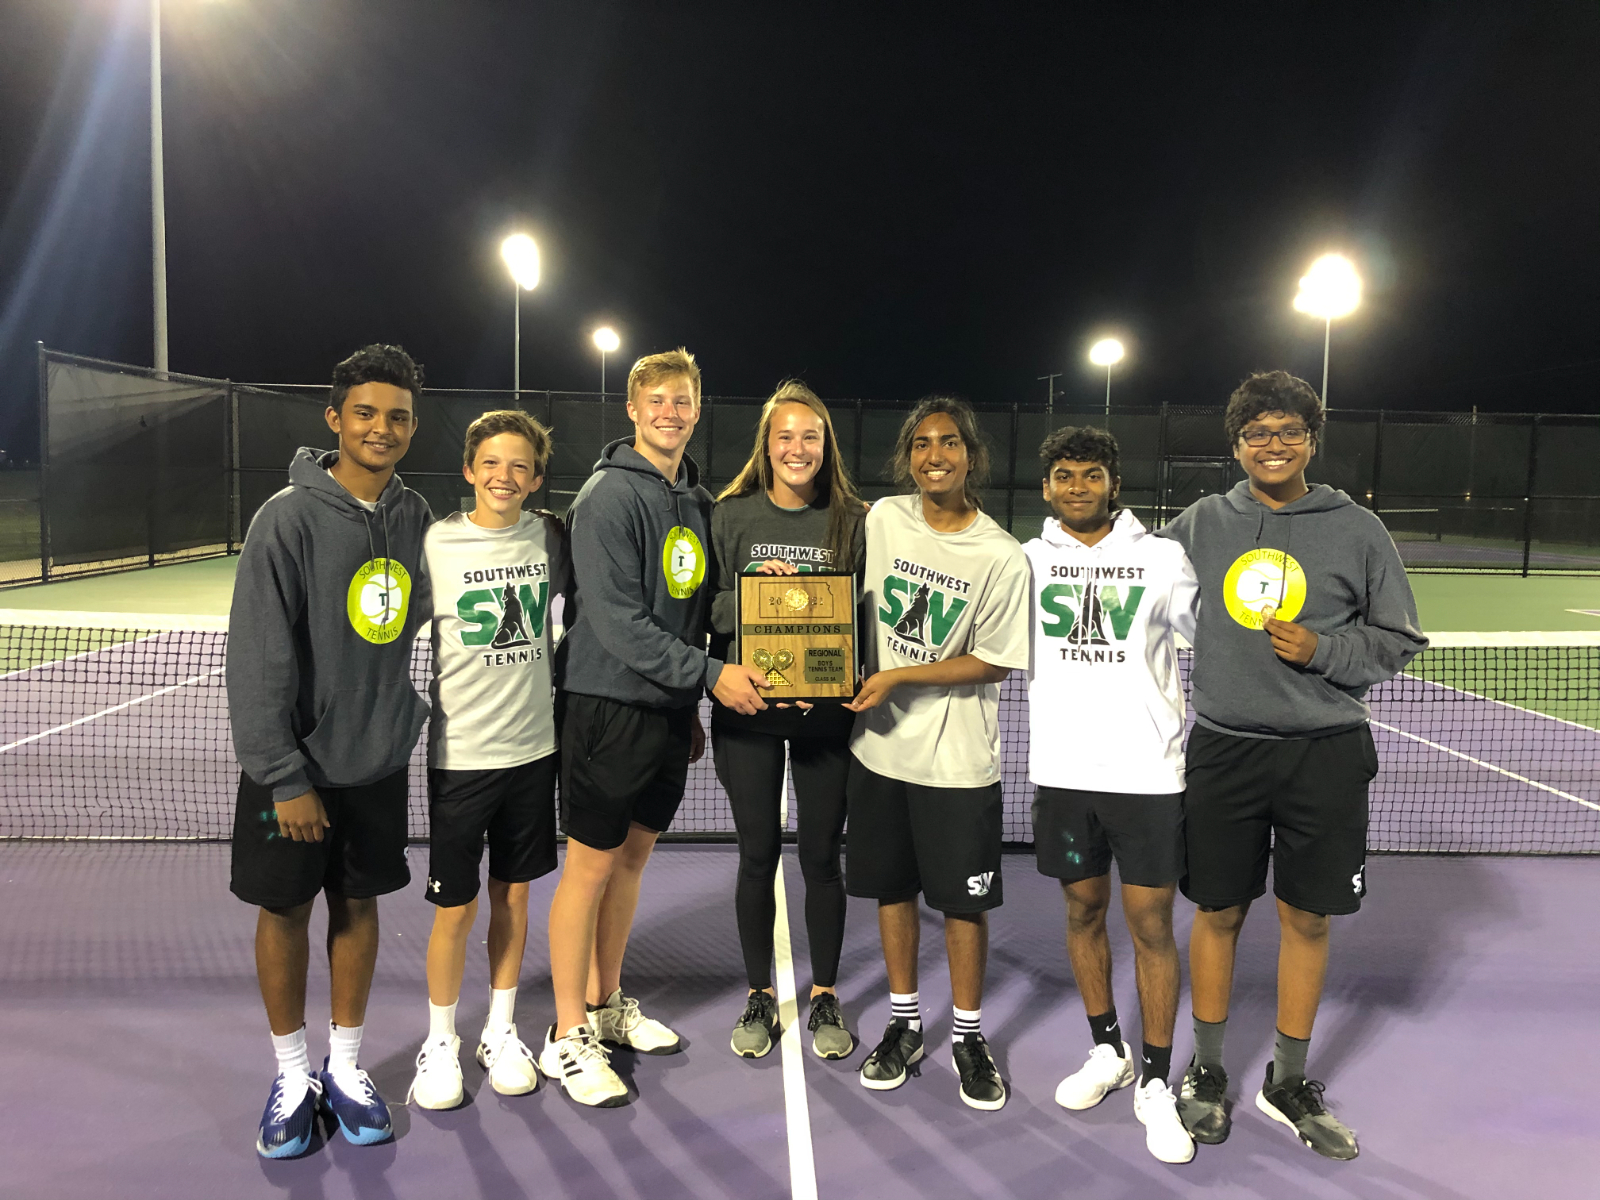 BVSW is 2021's Boys Regional Champion Tennis Team